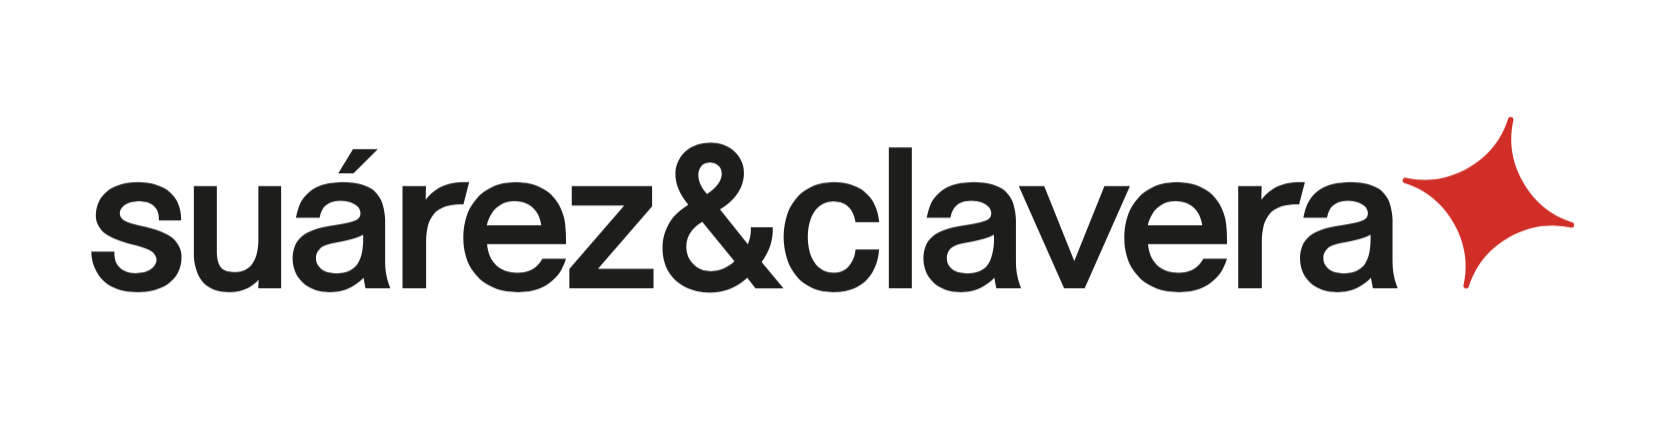 Suarez & Clavera